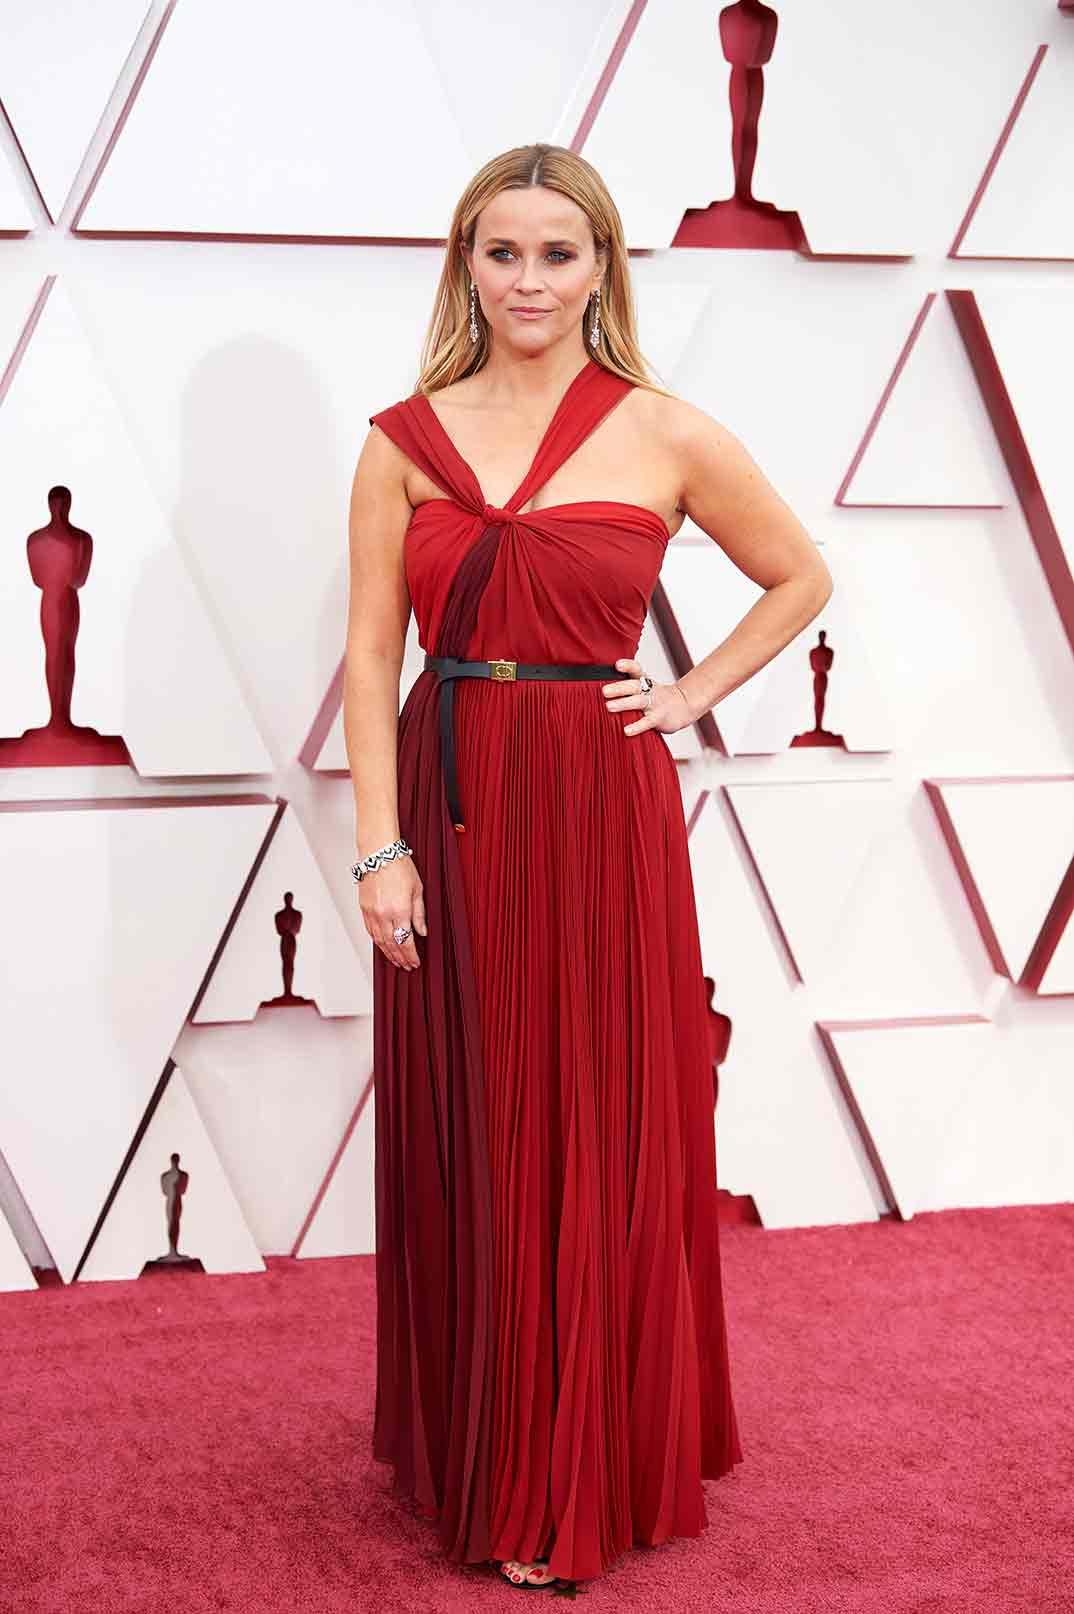 Reese Witherspoon - Premios Oscar 2021 © Matt Petit / AMPAS